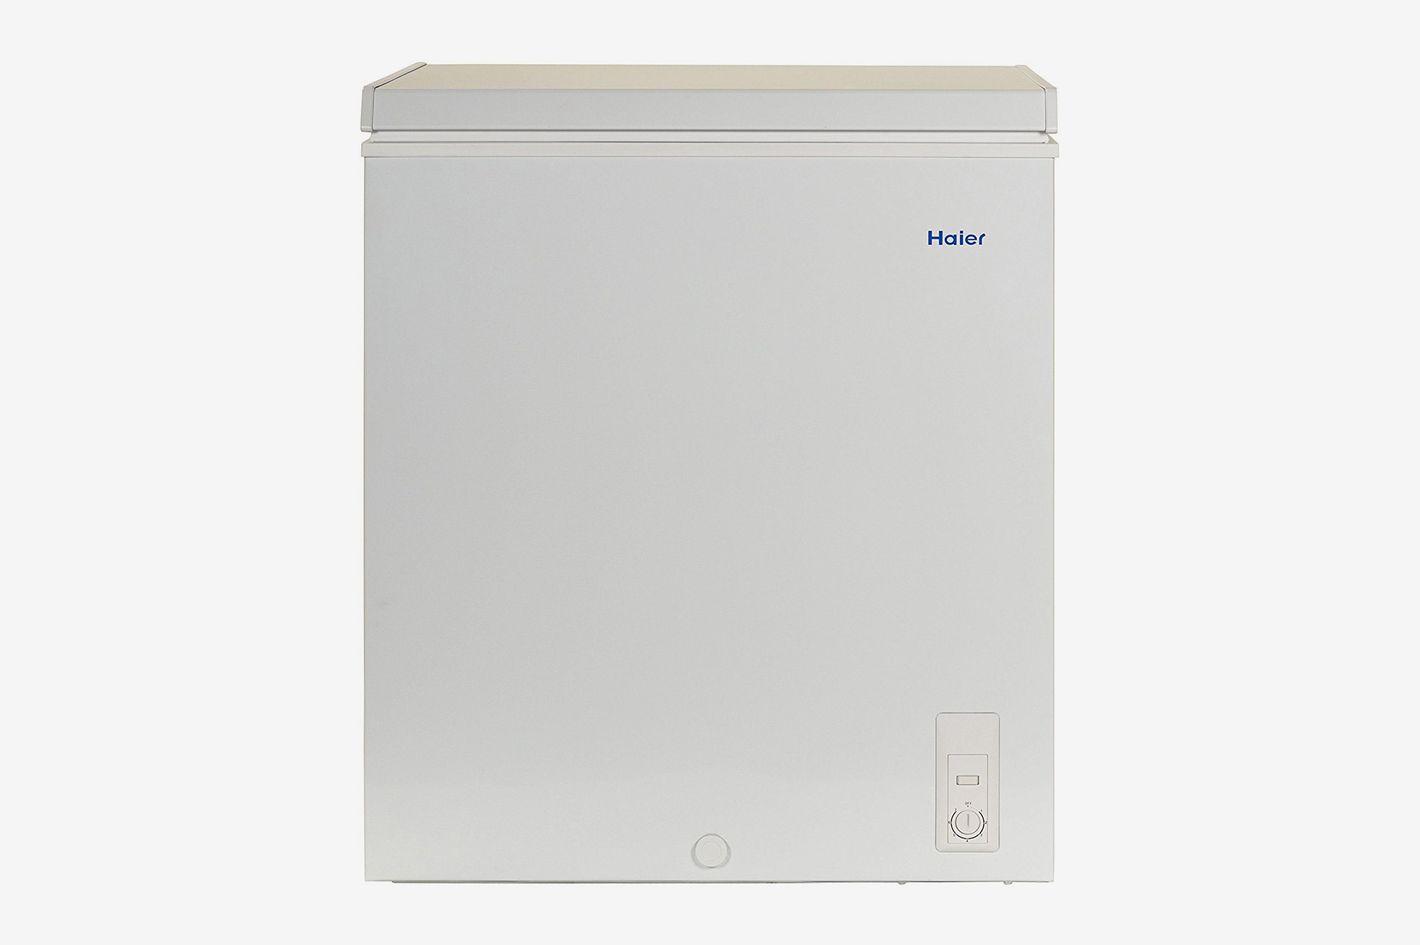 Haier 5.0 Cubic Feet Chest Freezer